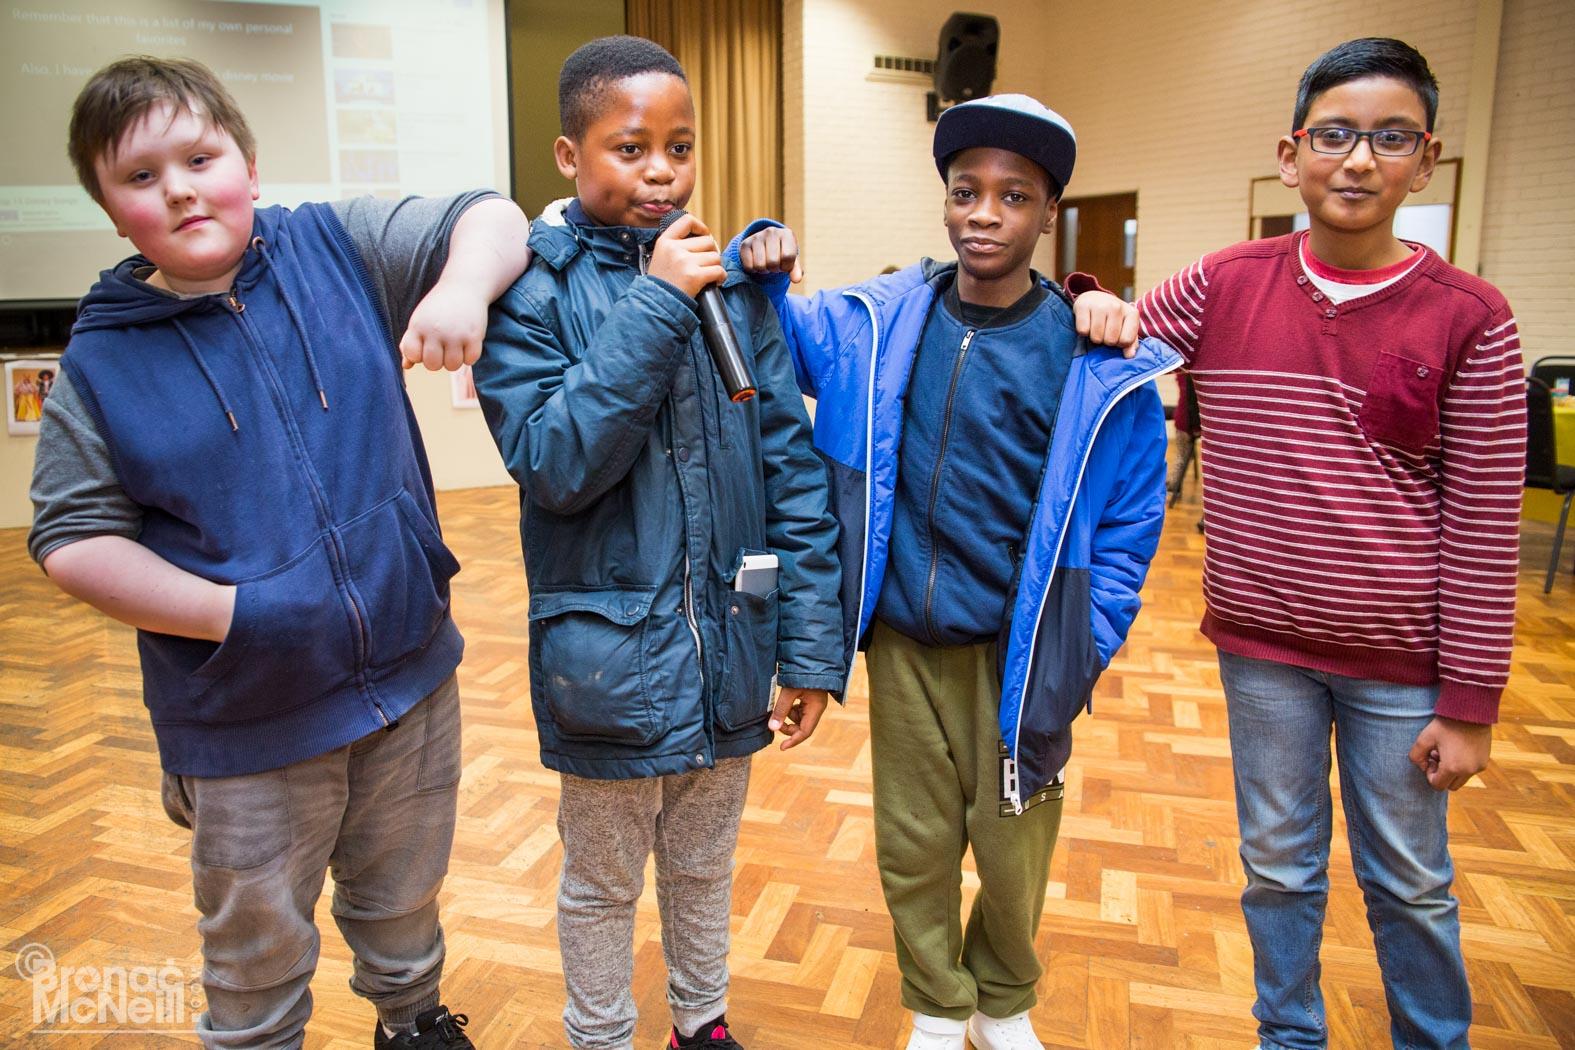 4 children standing up